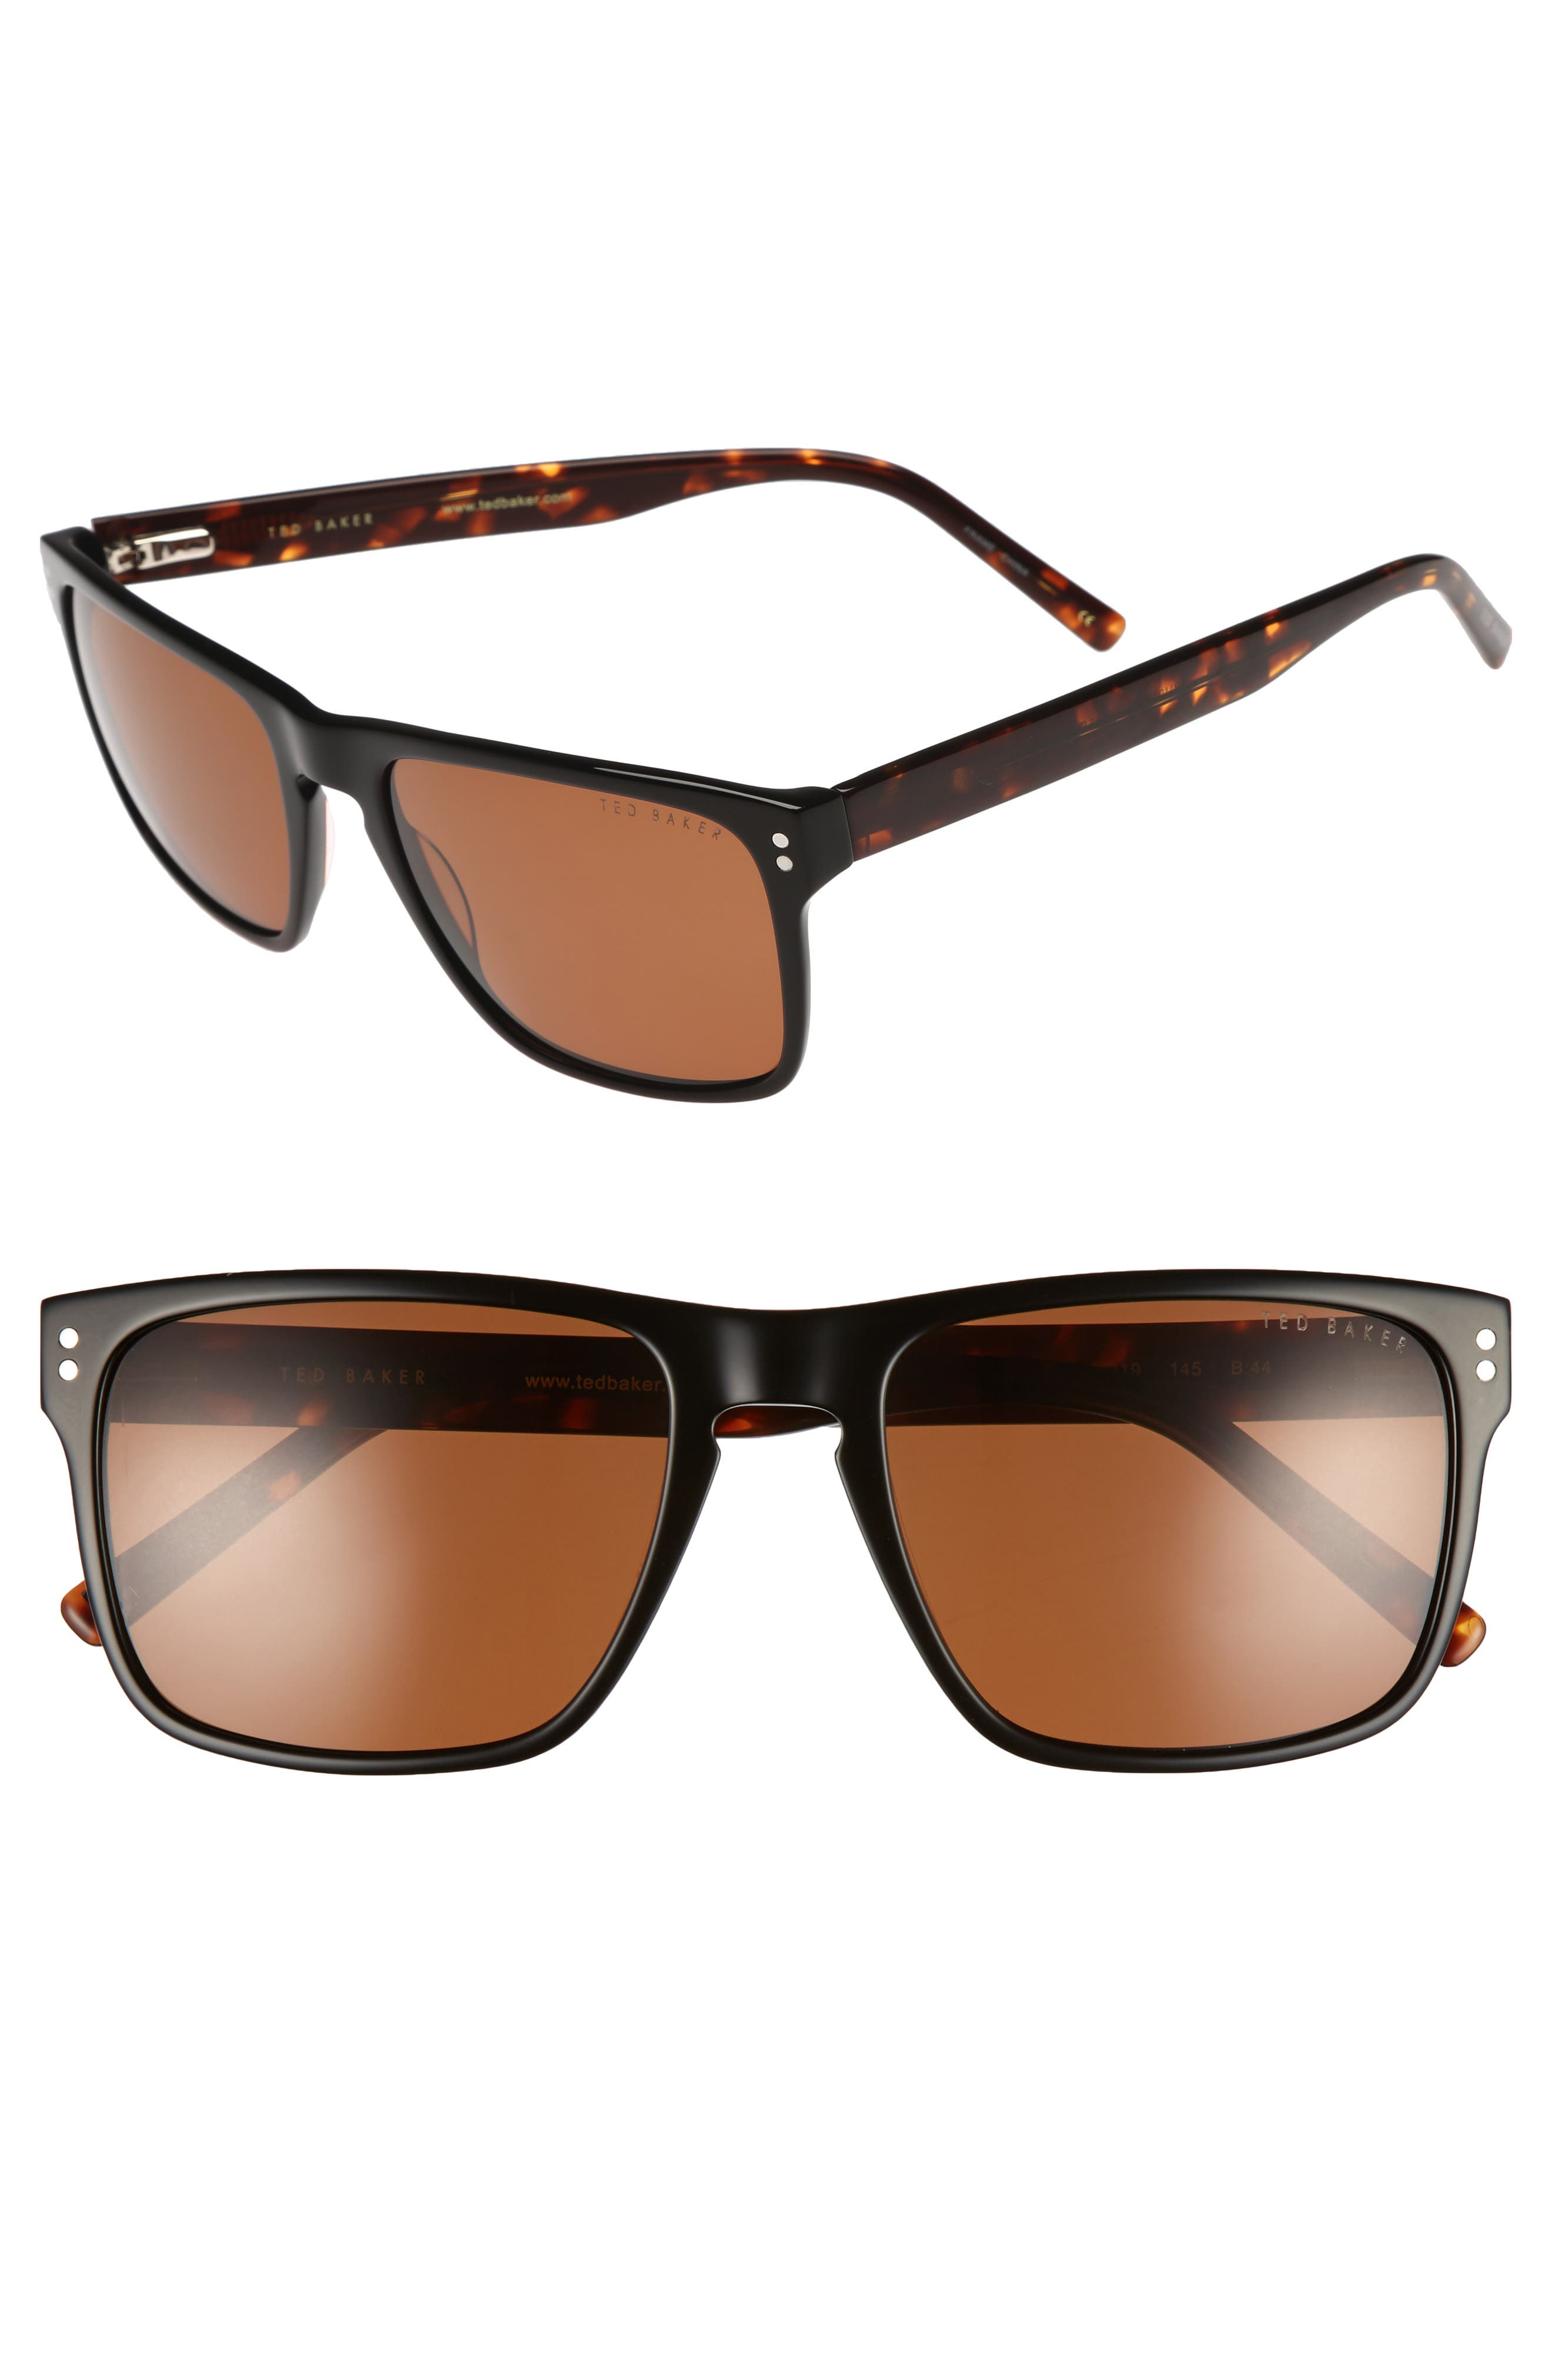 56mm Polarized Rectangle Sunglasses,                         Main,                         color, Tortoise